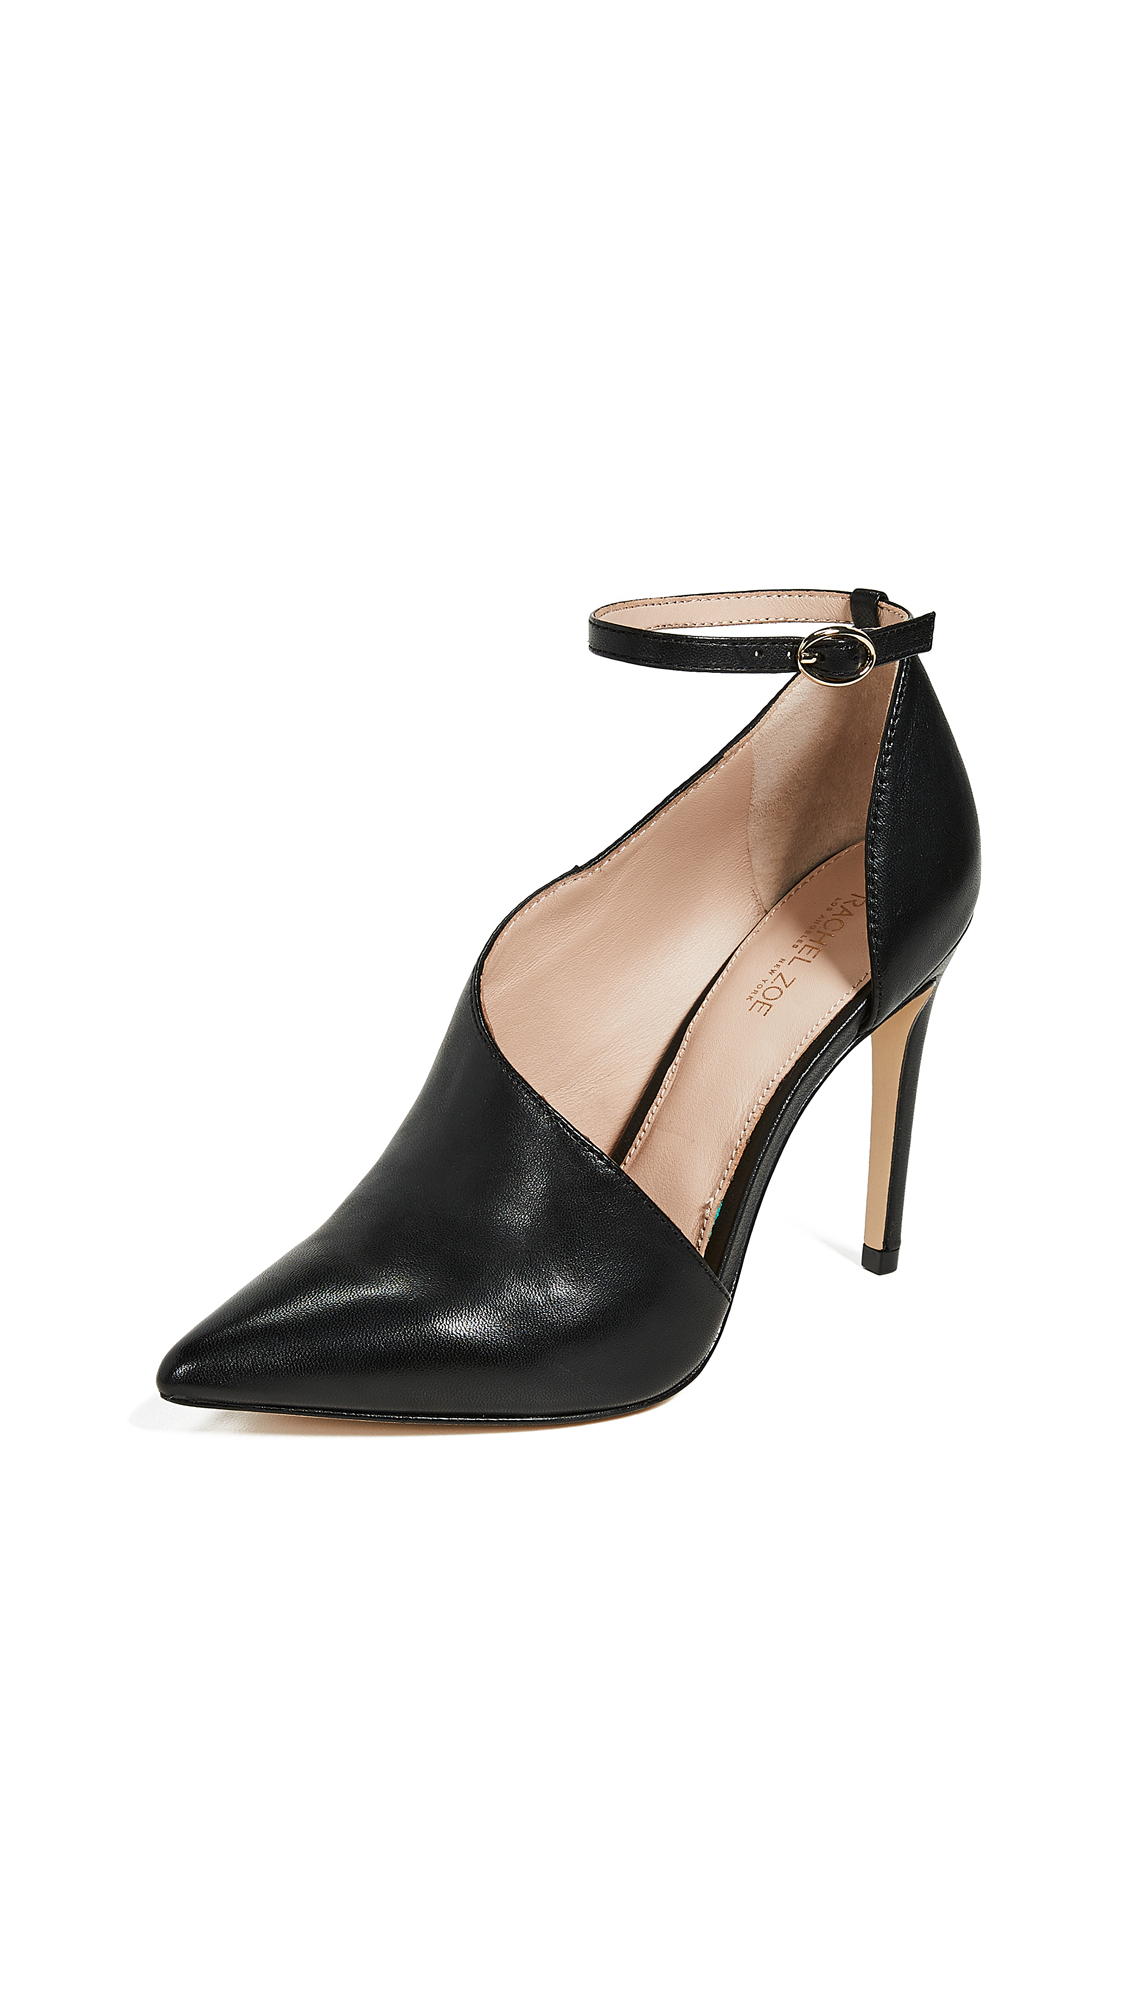 Rachel Zoe Skylar Ankle Strap Pumps - Black